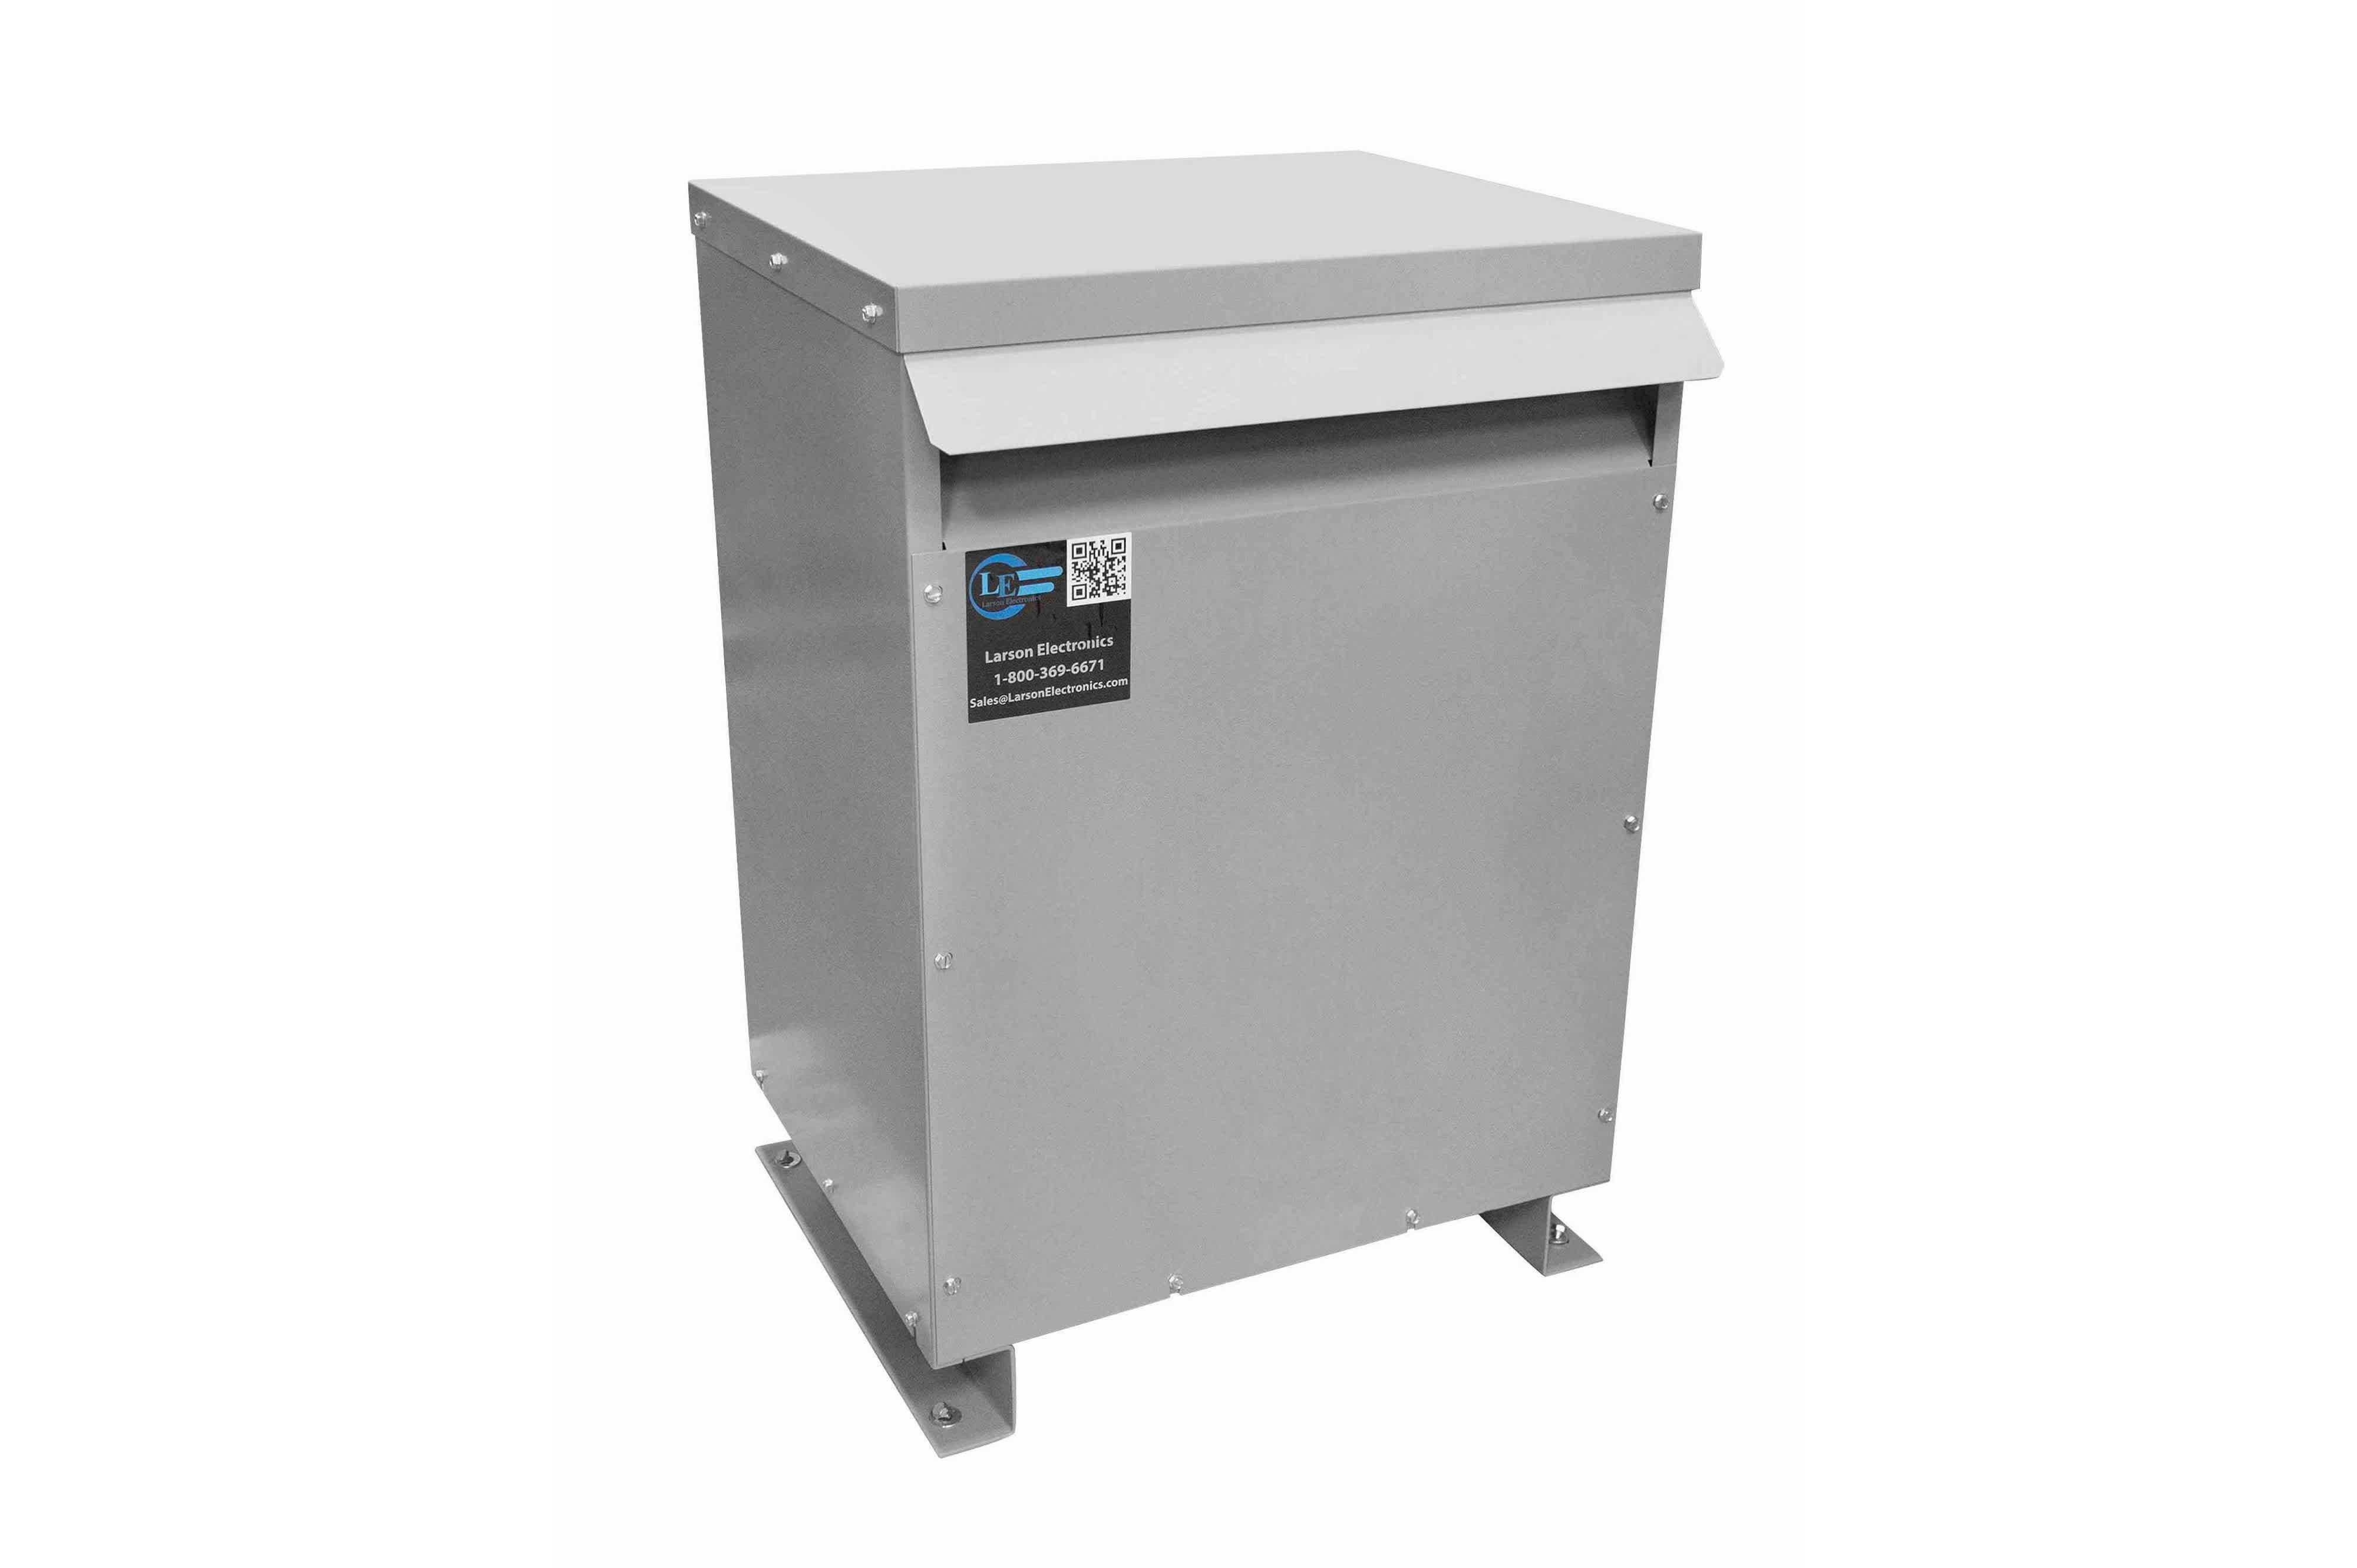 45 kVA 3PH Isolation Transformer, 600V Wye Primary, 208Y/120 Wye-N Secondary, N3R, Ventilated, 60 Hz